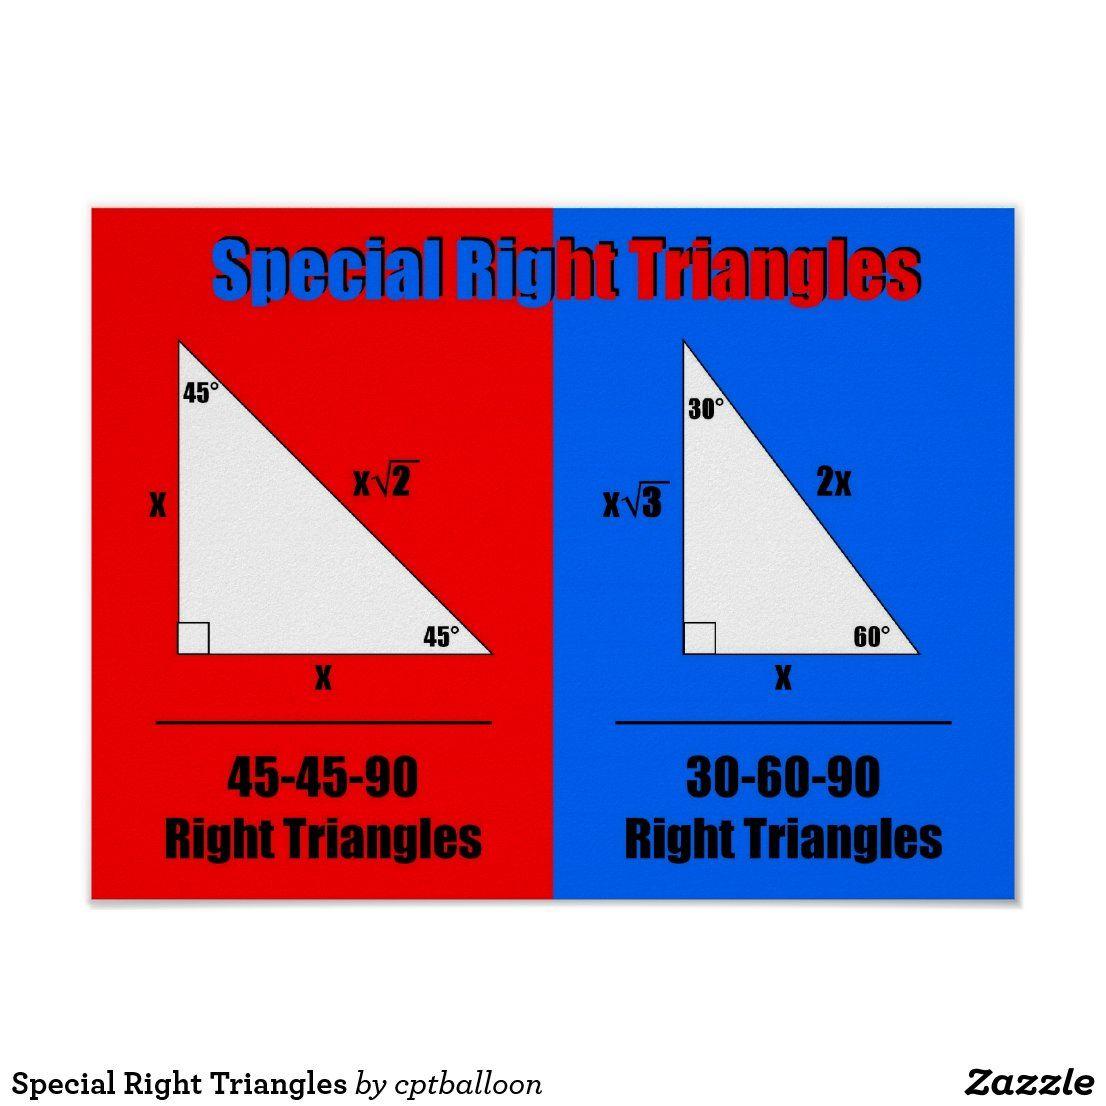 Special Right Triangles Poster Zazzle Com In 2021 Special Right Triangle Math Poster Right Triangle [ 1106 x 1106 Pixel ]